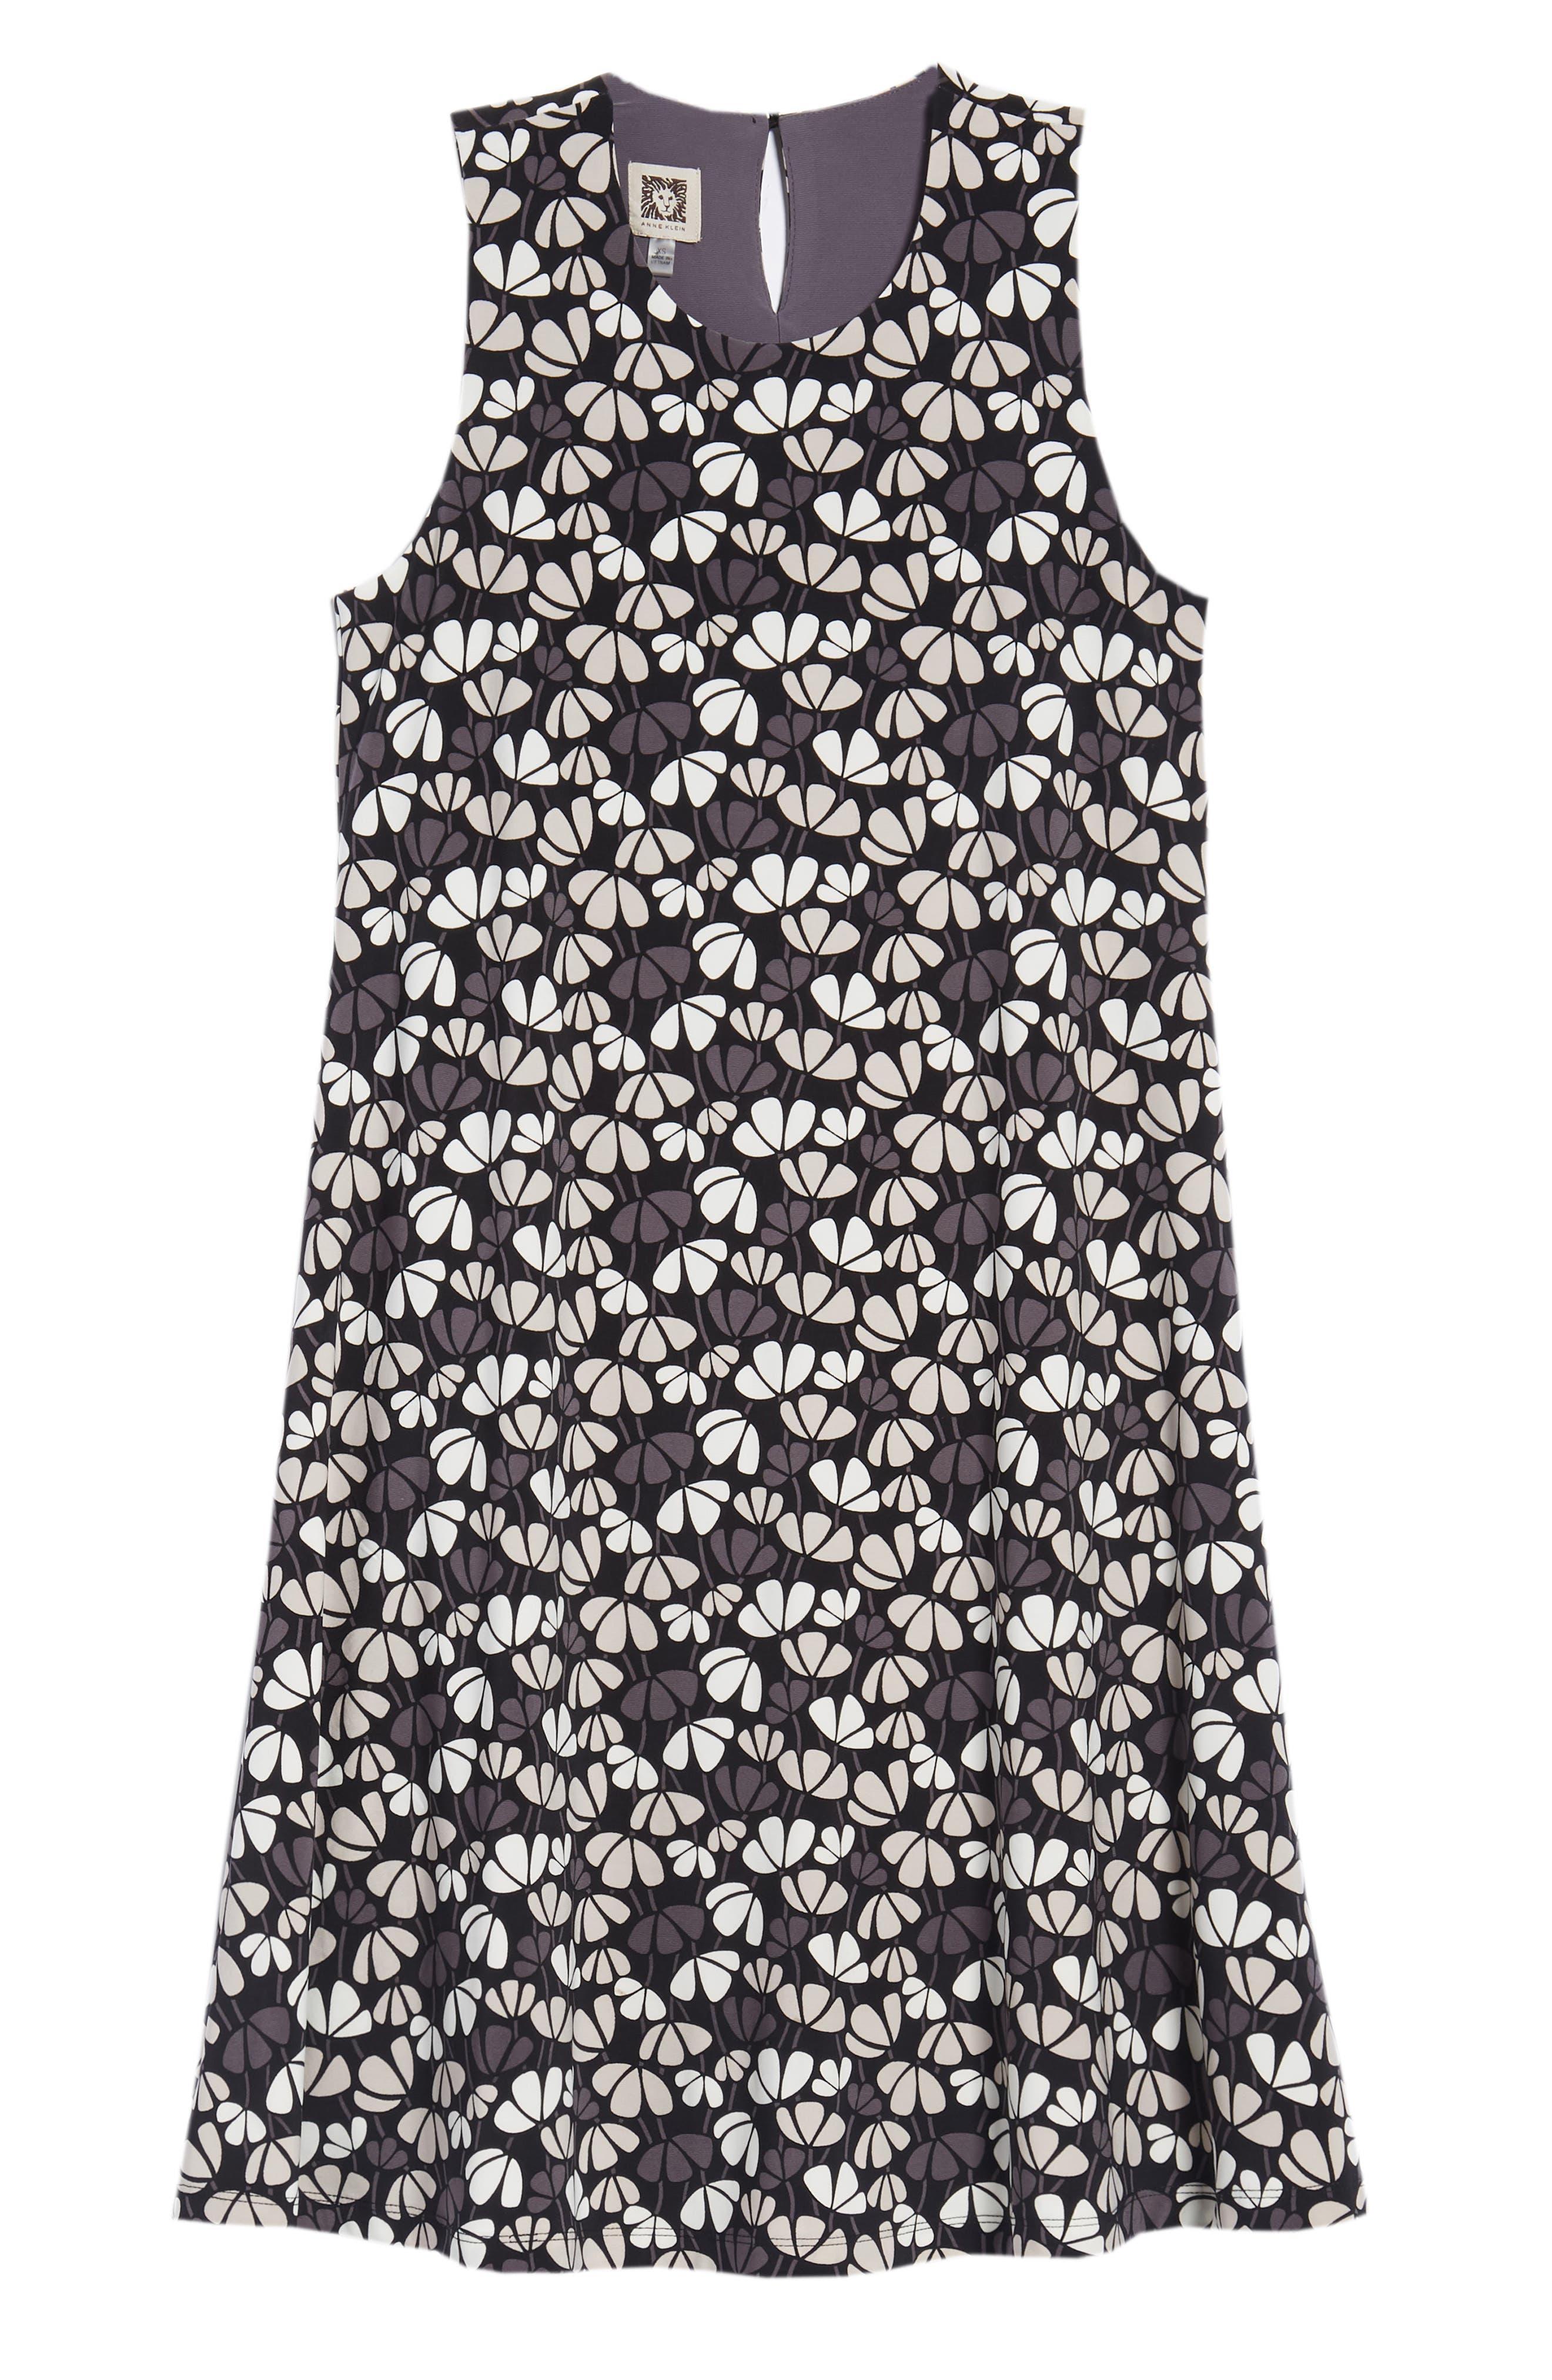 Flowerfall Stretch Knit Swing Dress,                             Alternate thumbnail 7, color,                             001